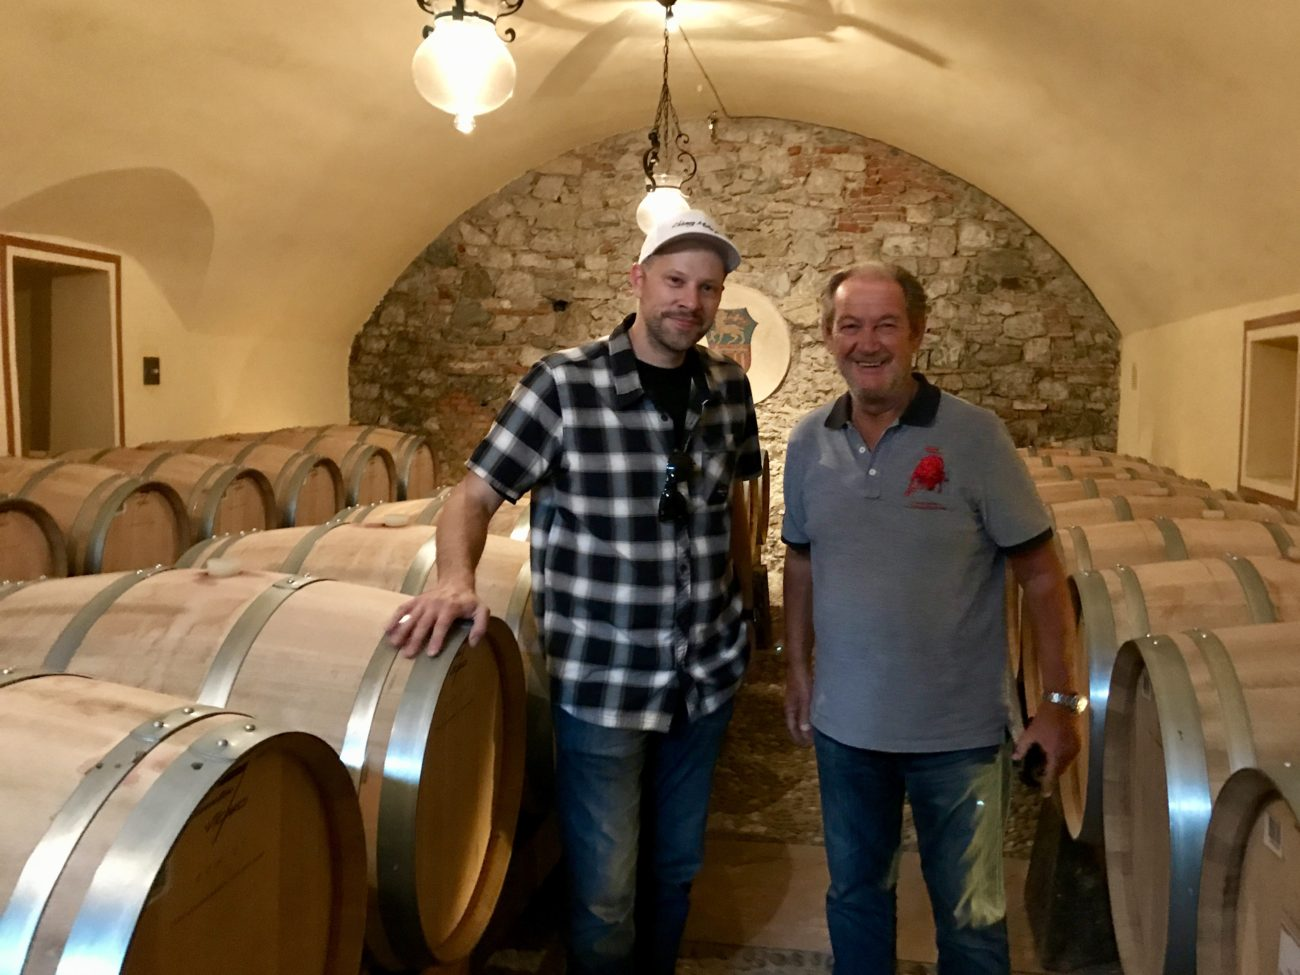 Arne's Antics and Valentino Balboni at Ruffino Winery in Tuscany Italy Adventure Drives AD.04